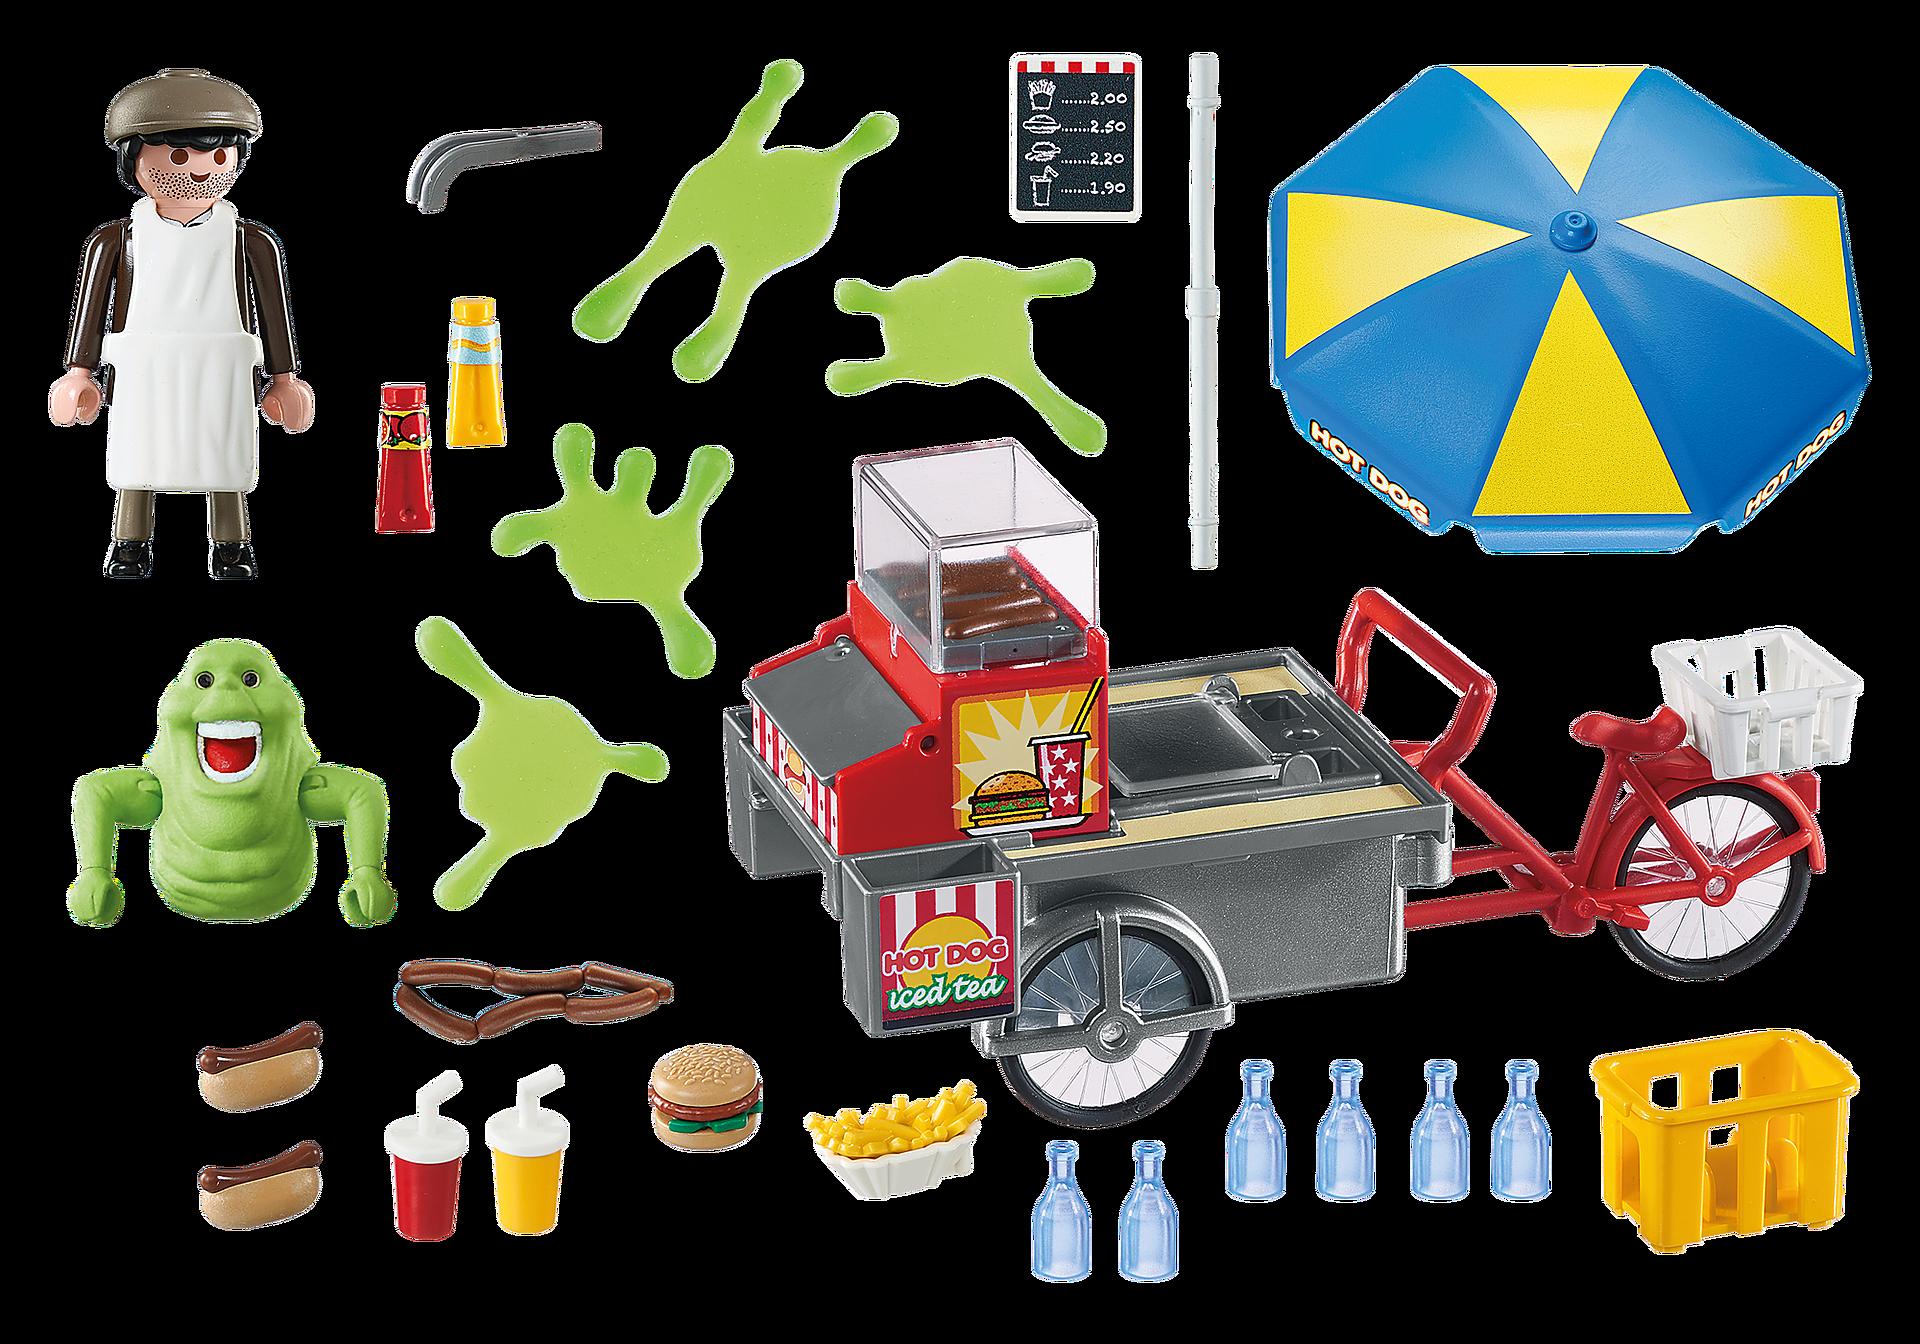 9222 Лизун и торговая тележка с хот-догами zoom image4